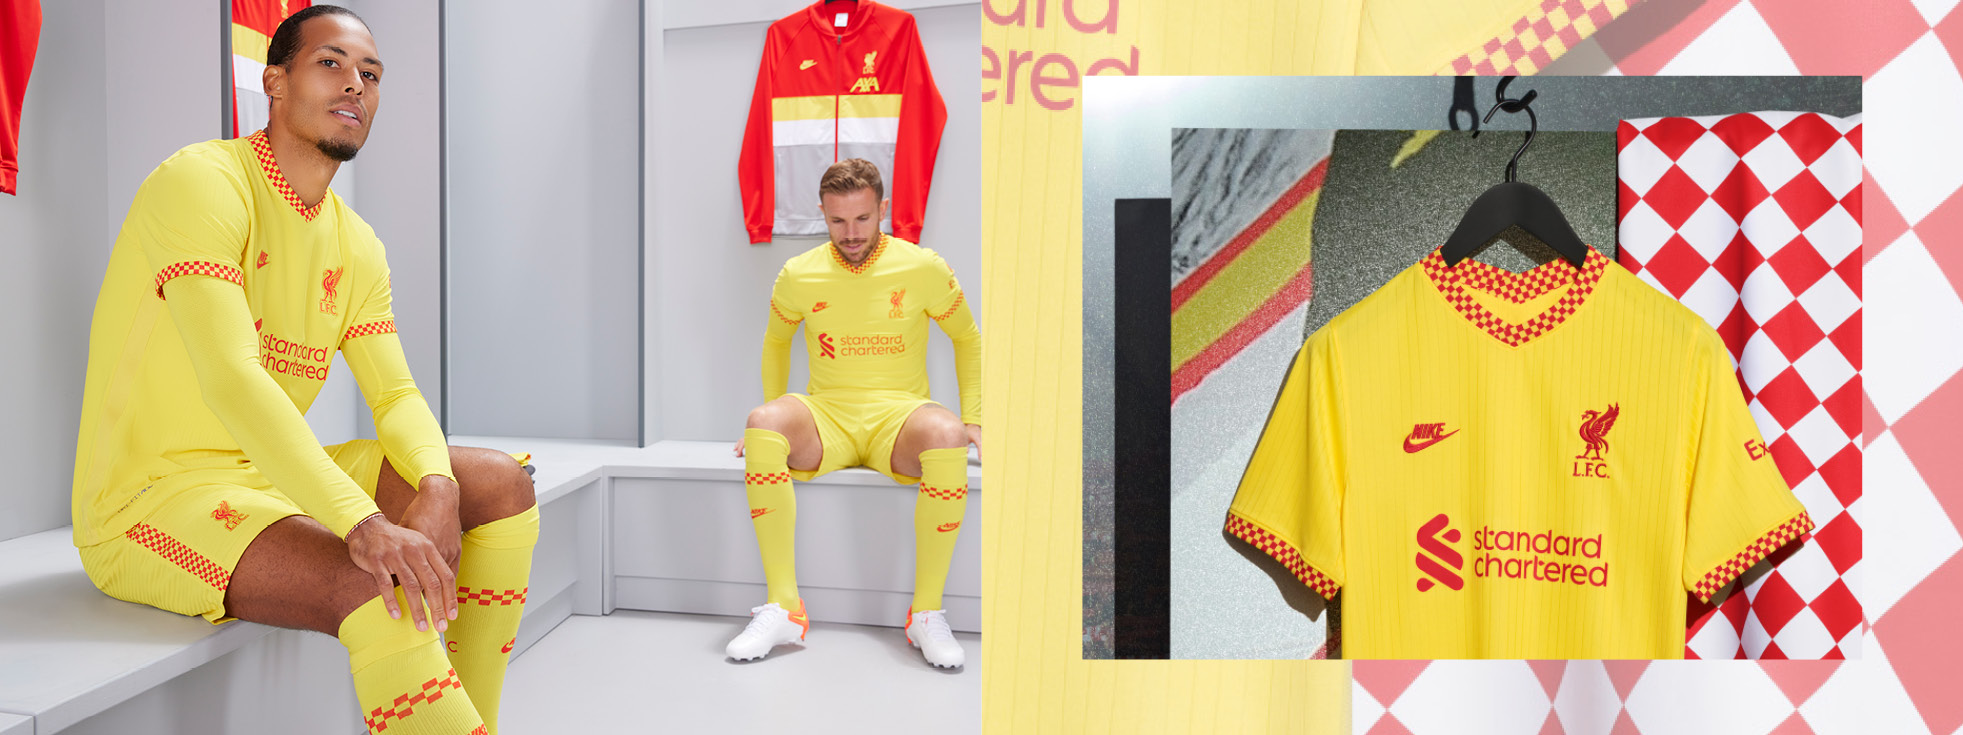 Liverpool 3RD Kit 2021-2022